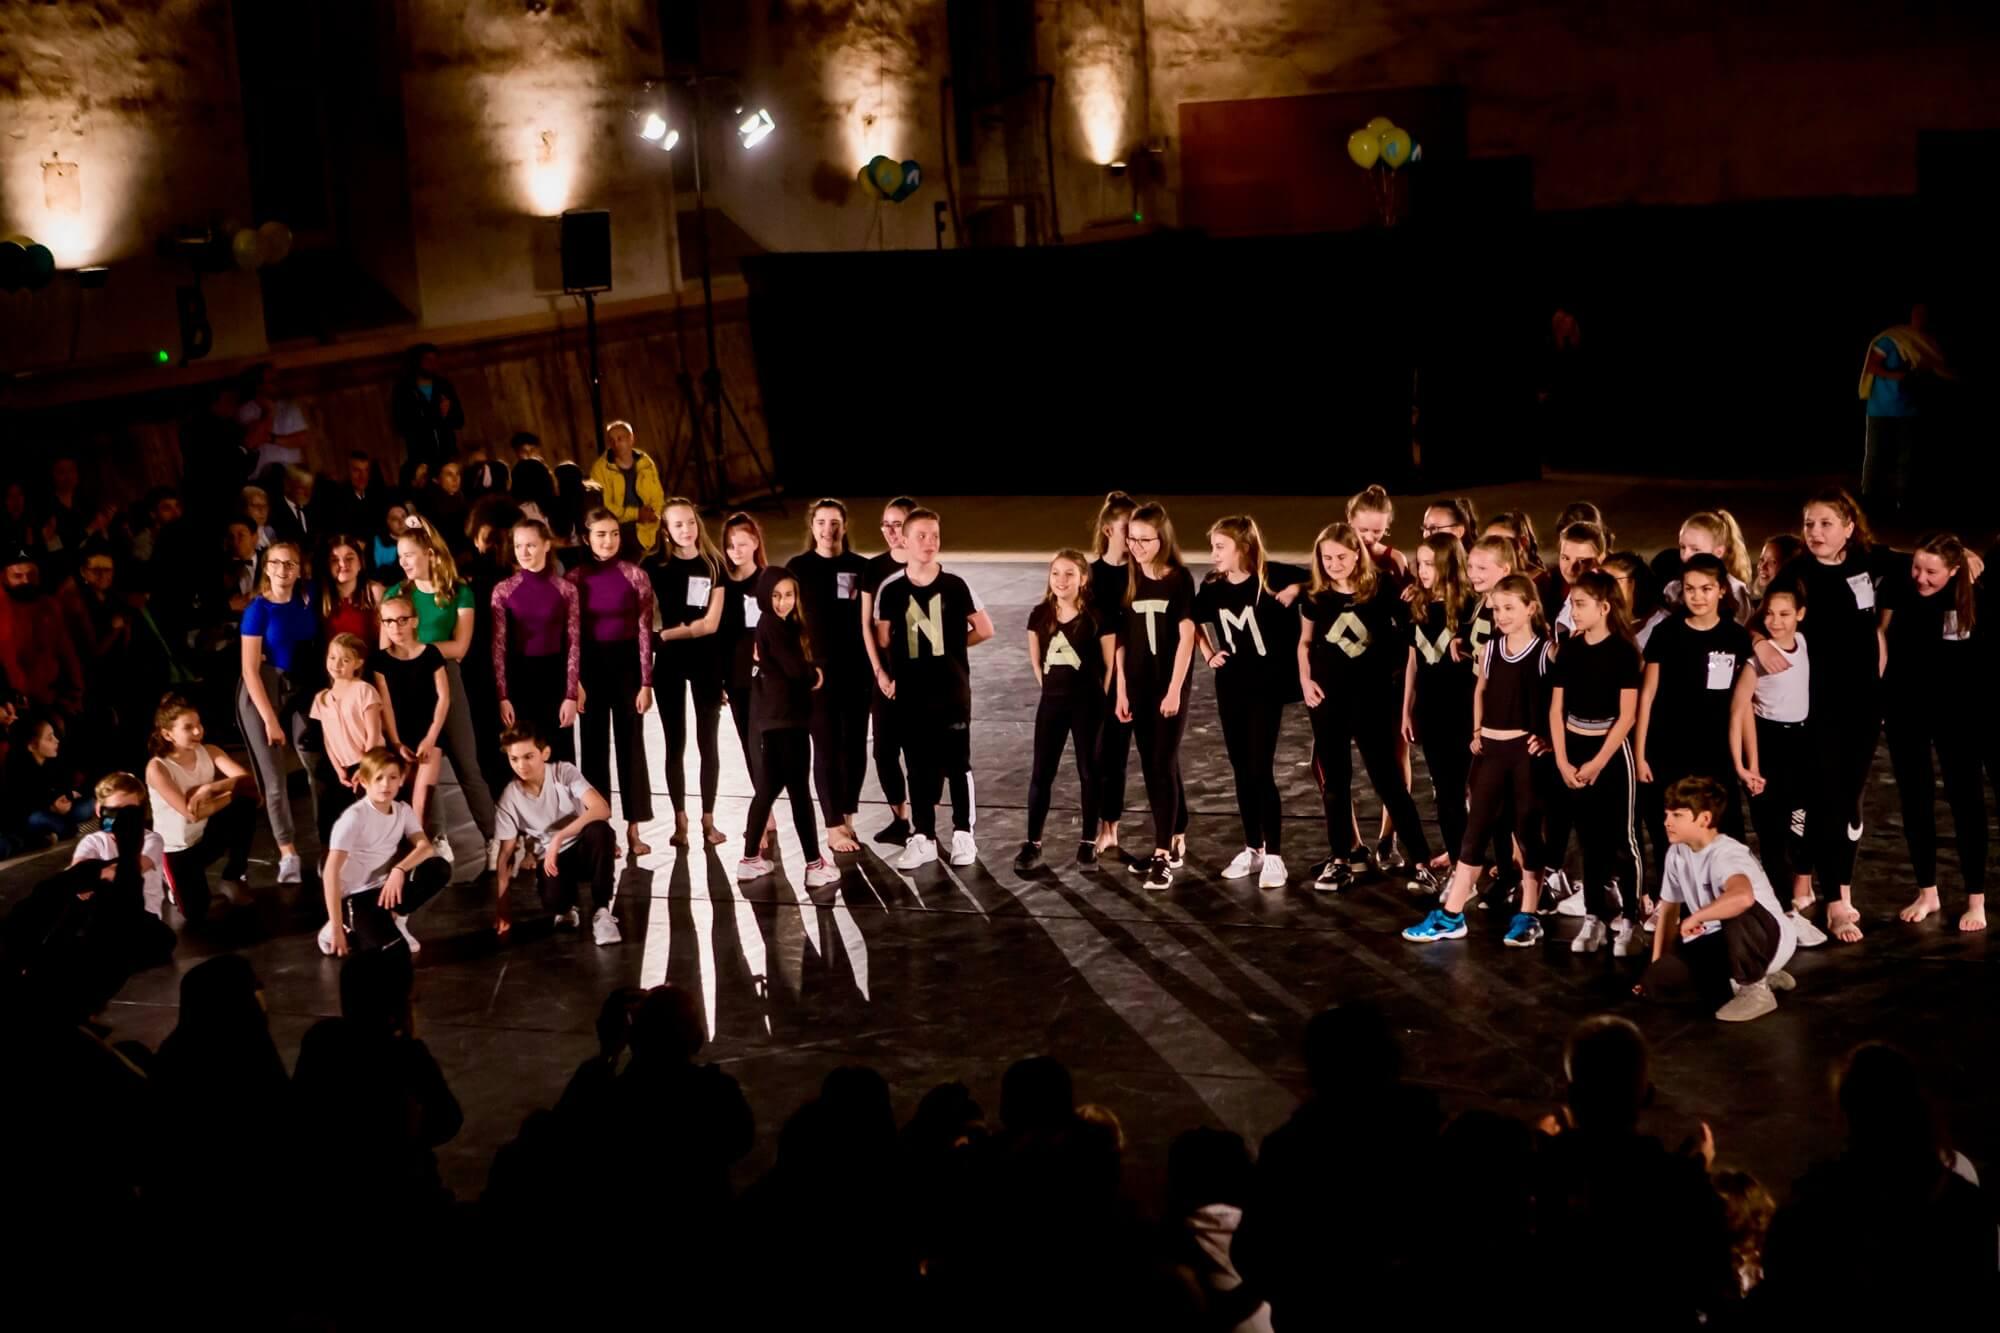 Natmove | Christoph Gurtner | stagetime.ch